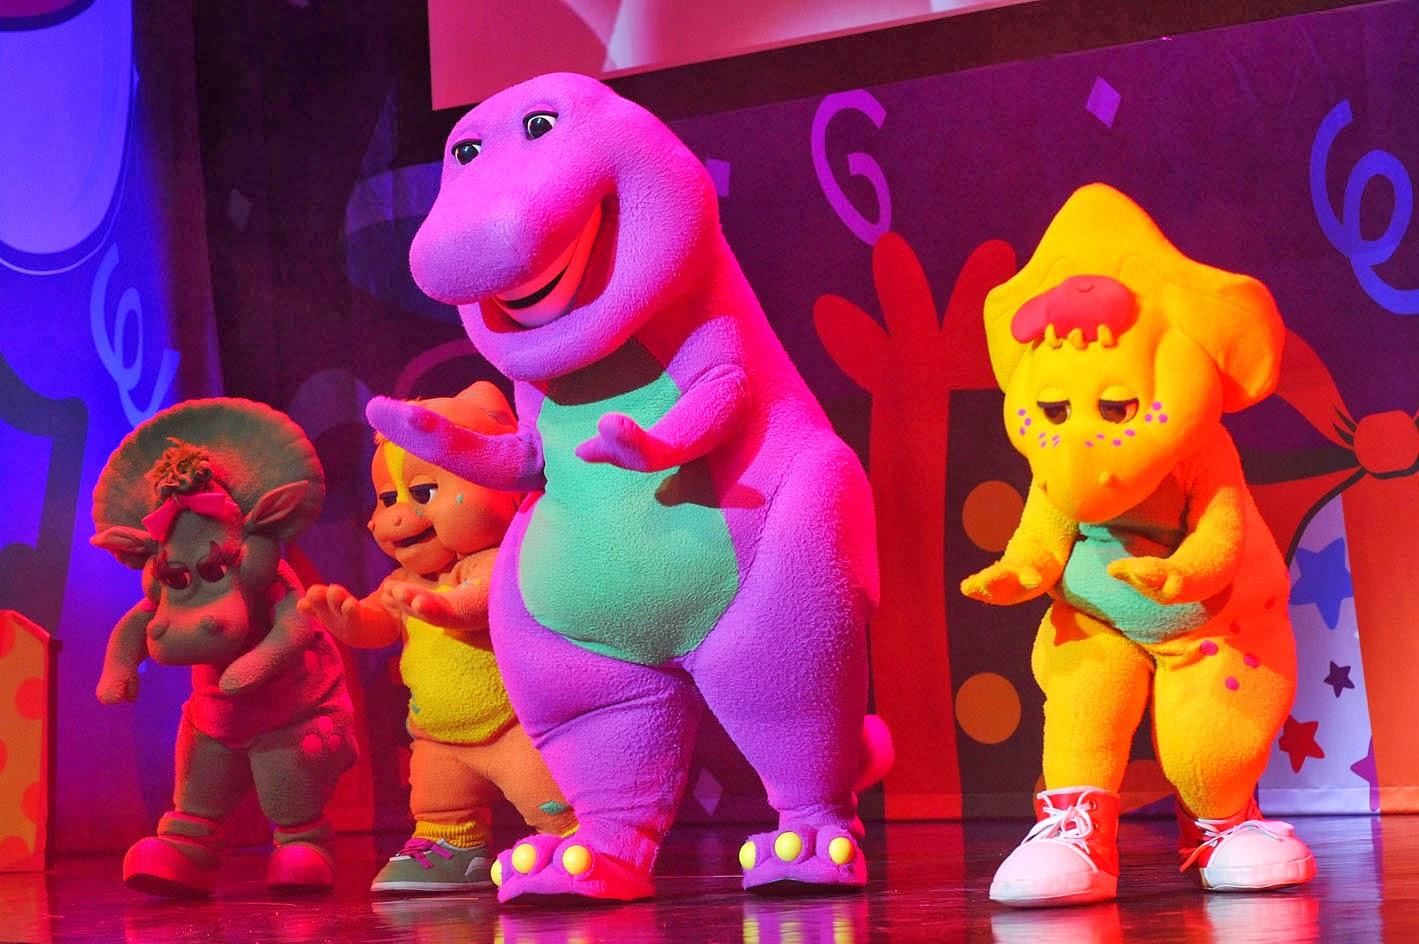 Purple Plum Fairy BARNEY INVITES YOU TO CELEBRATE HIS BIRTHDAY IN - Barney live in concert birthday